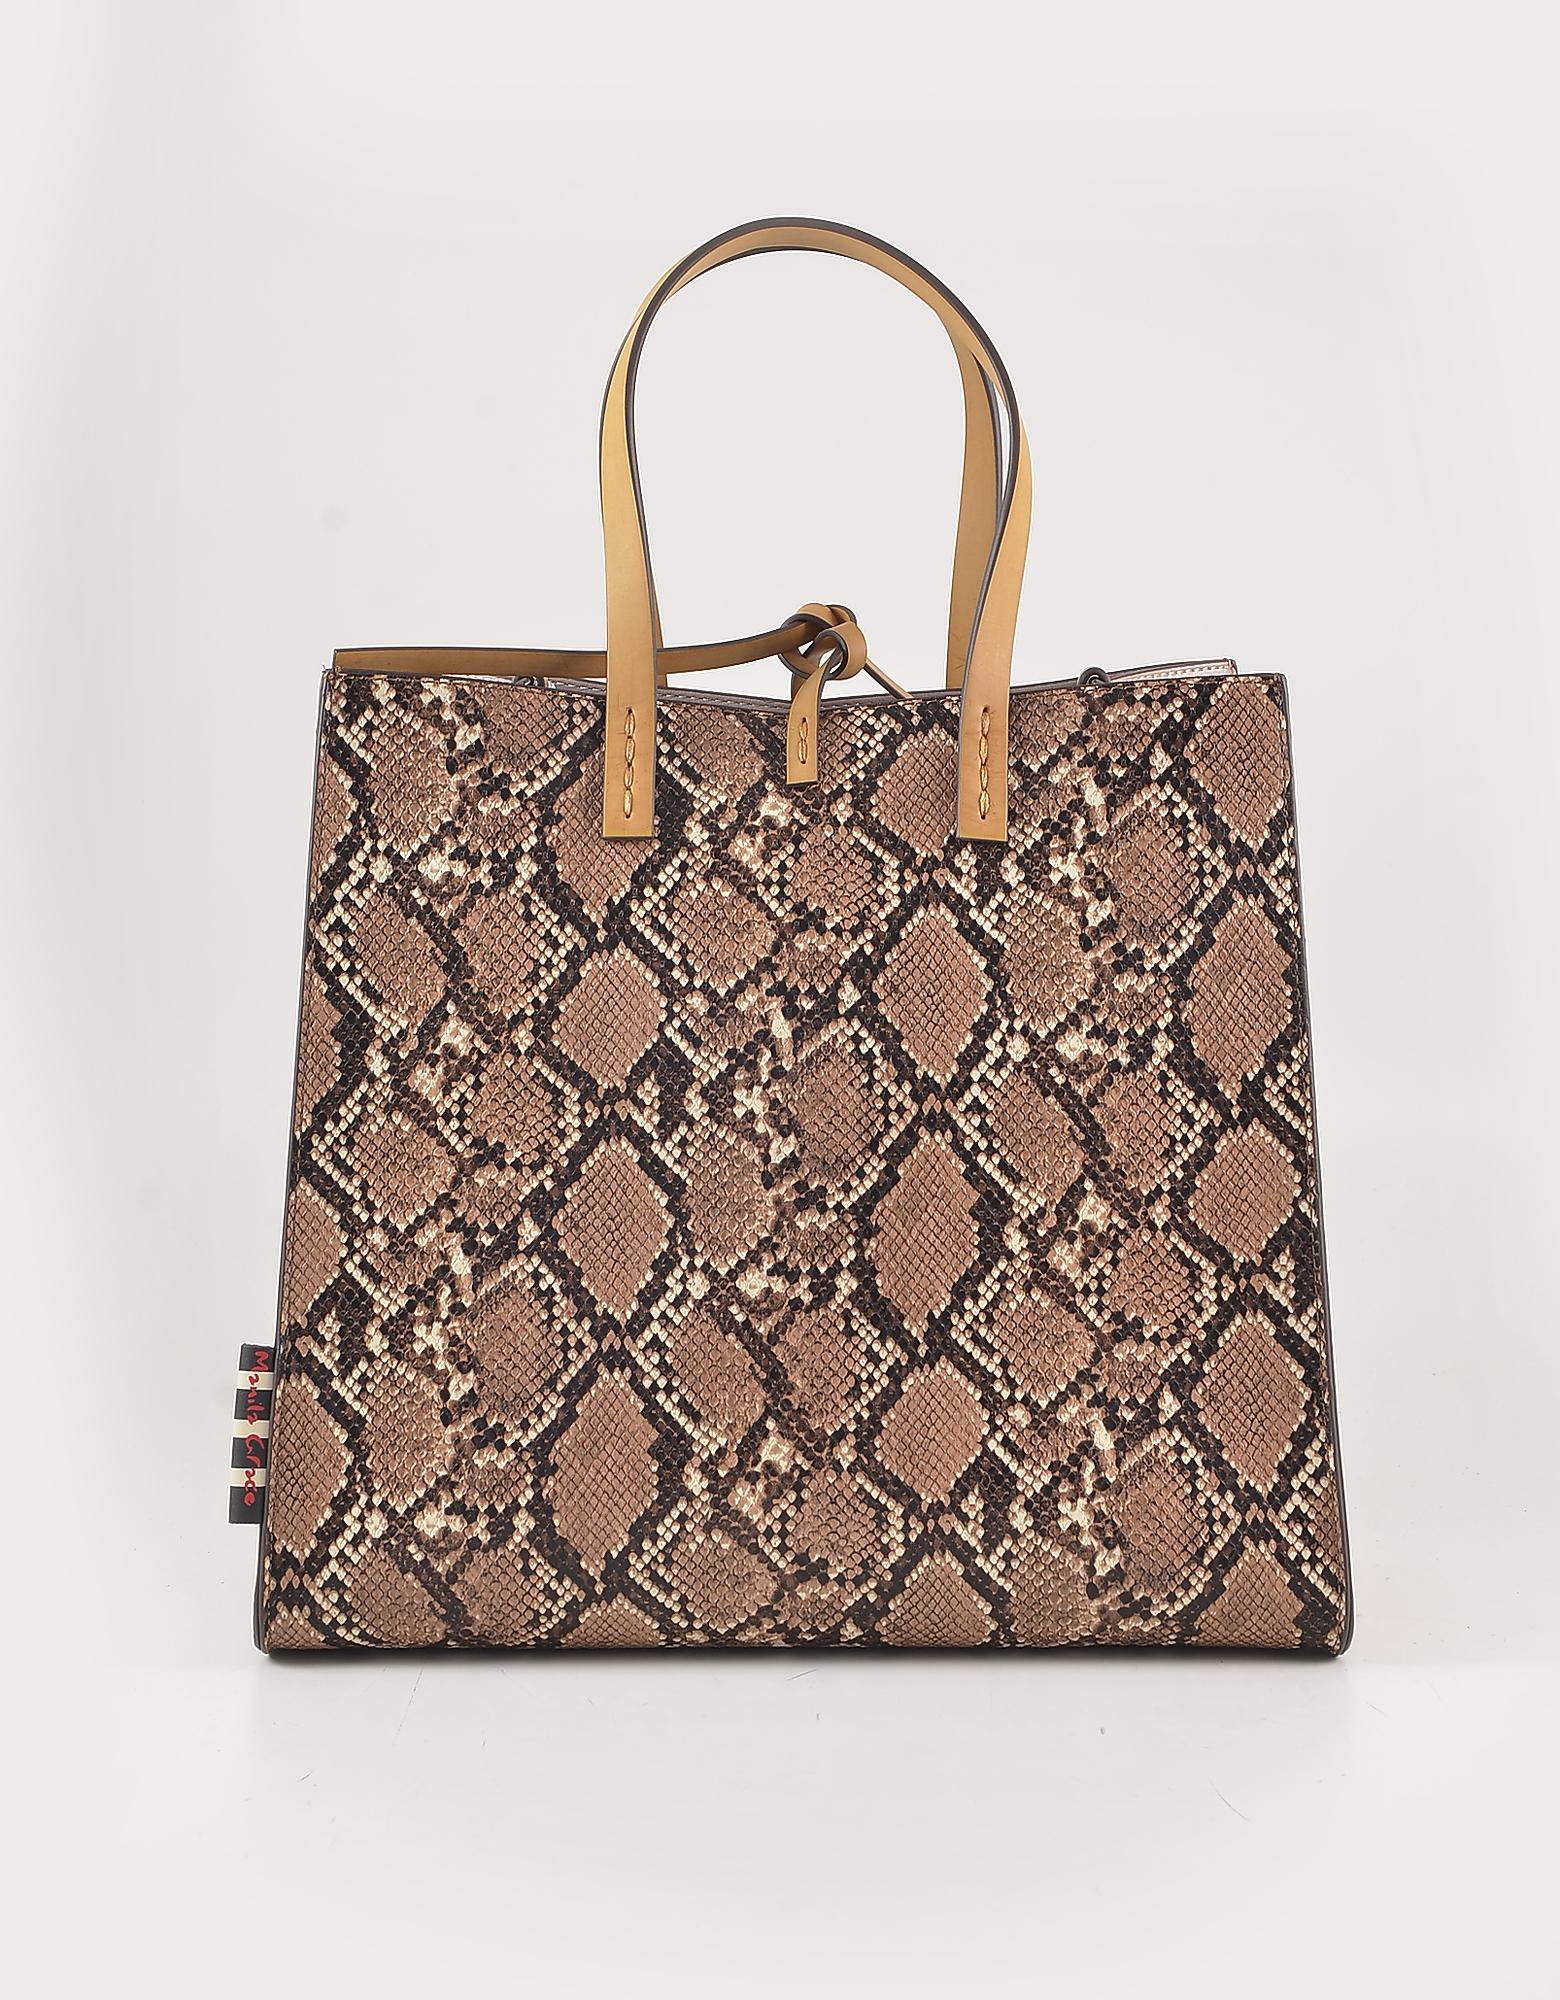 Manila Grace Animal Print Brown Eco Leather Tote Bag